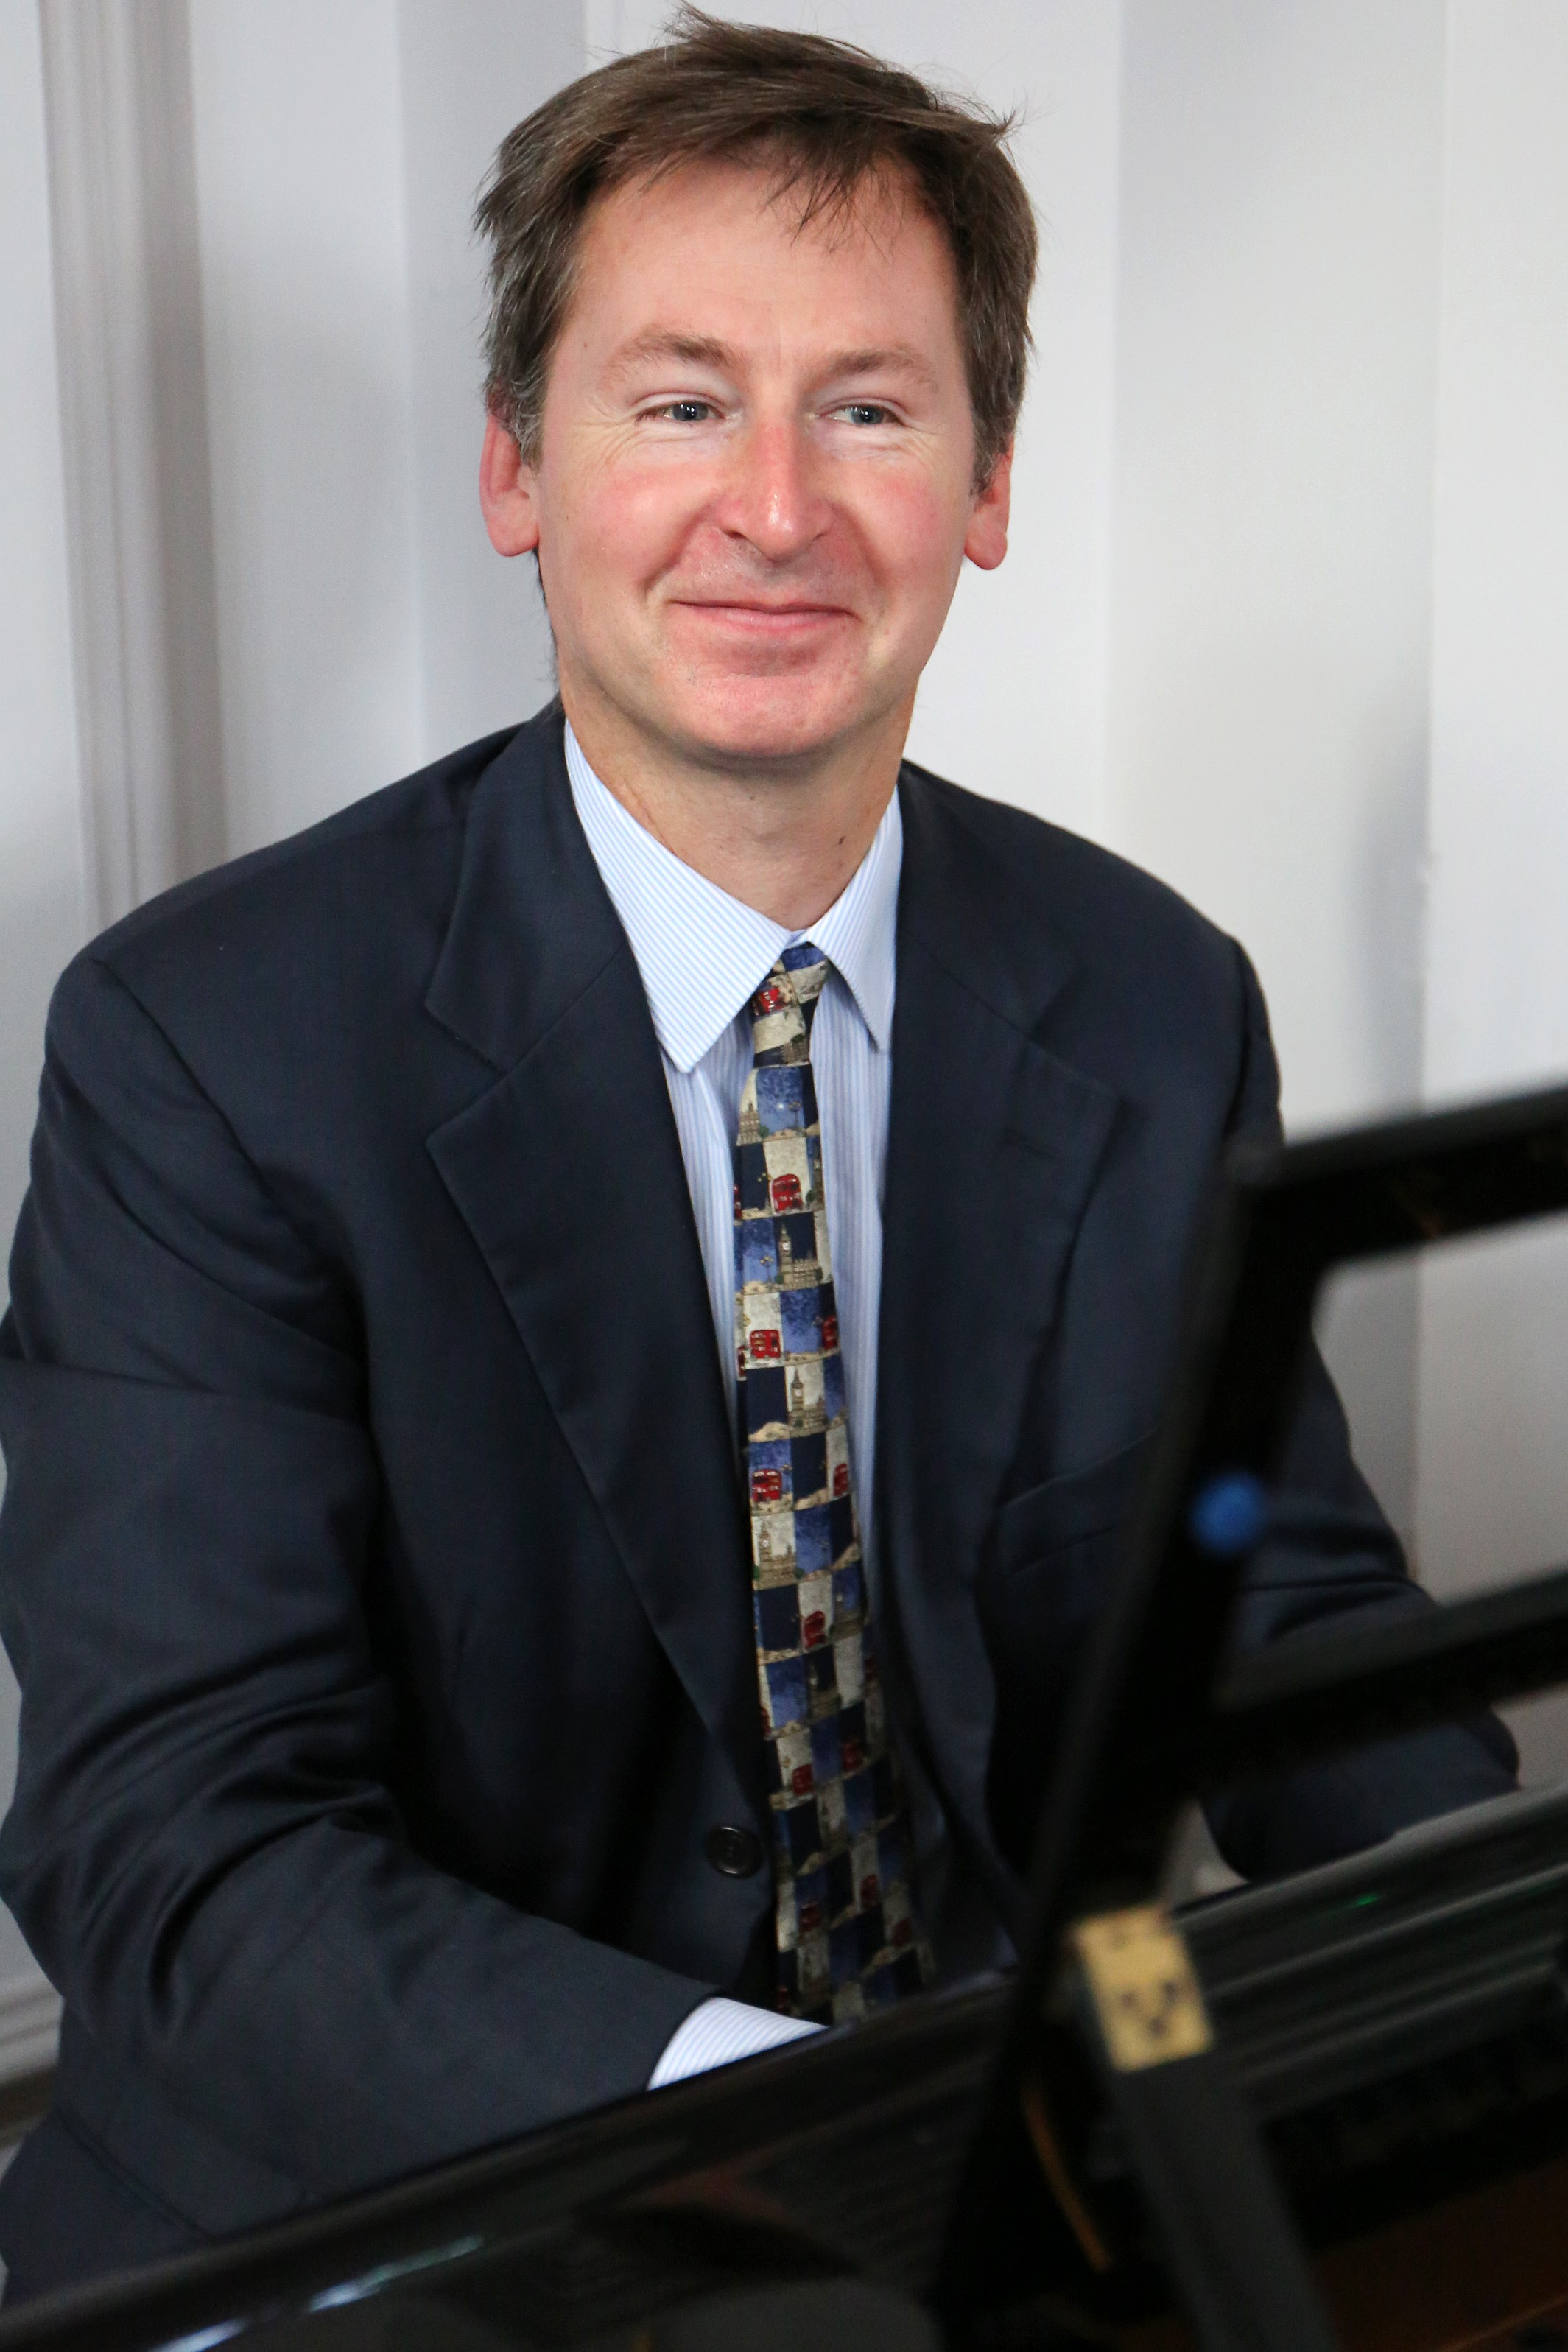 Philip Godfrey, Director of Music